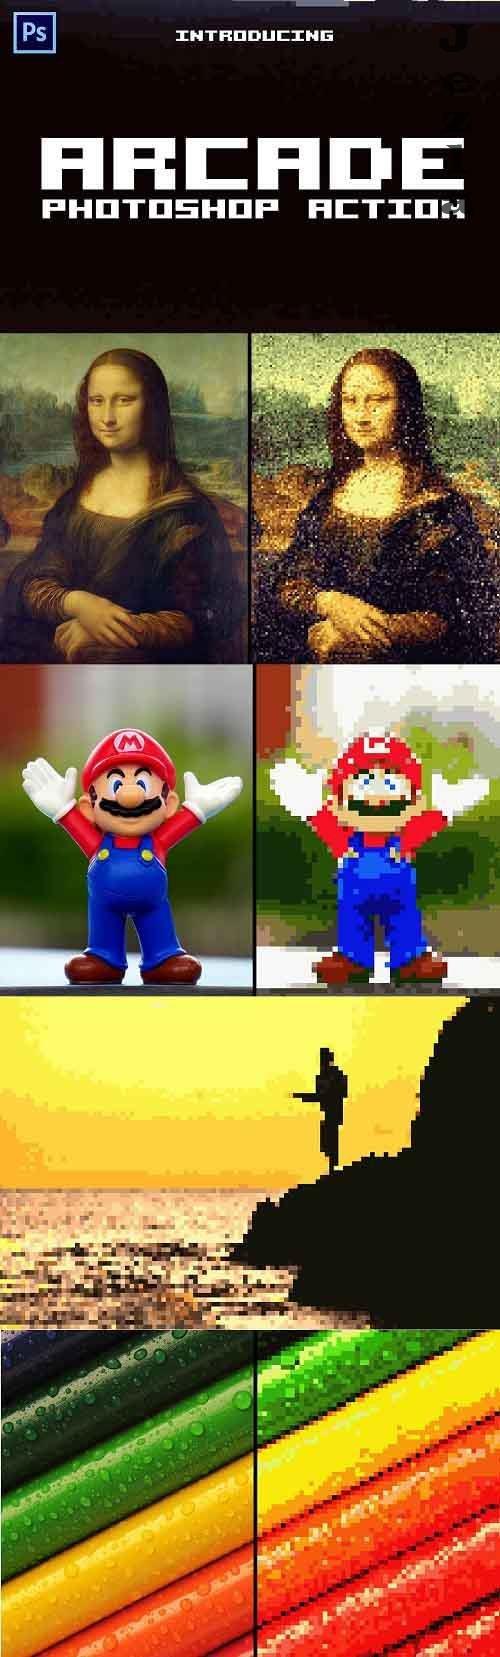 Arcade 8-bit Pixel Photoshop Action - 5656235